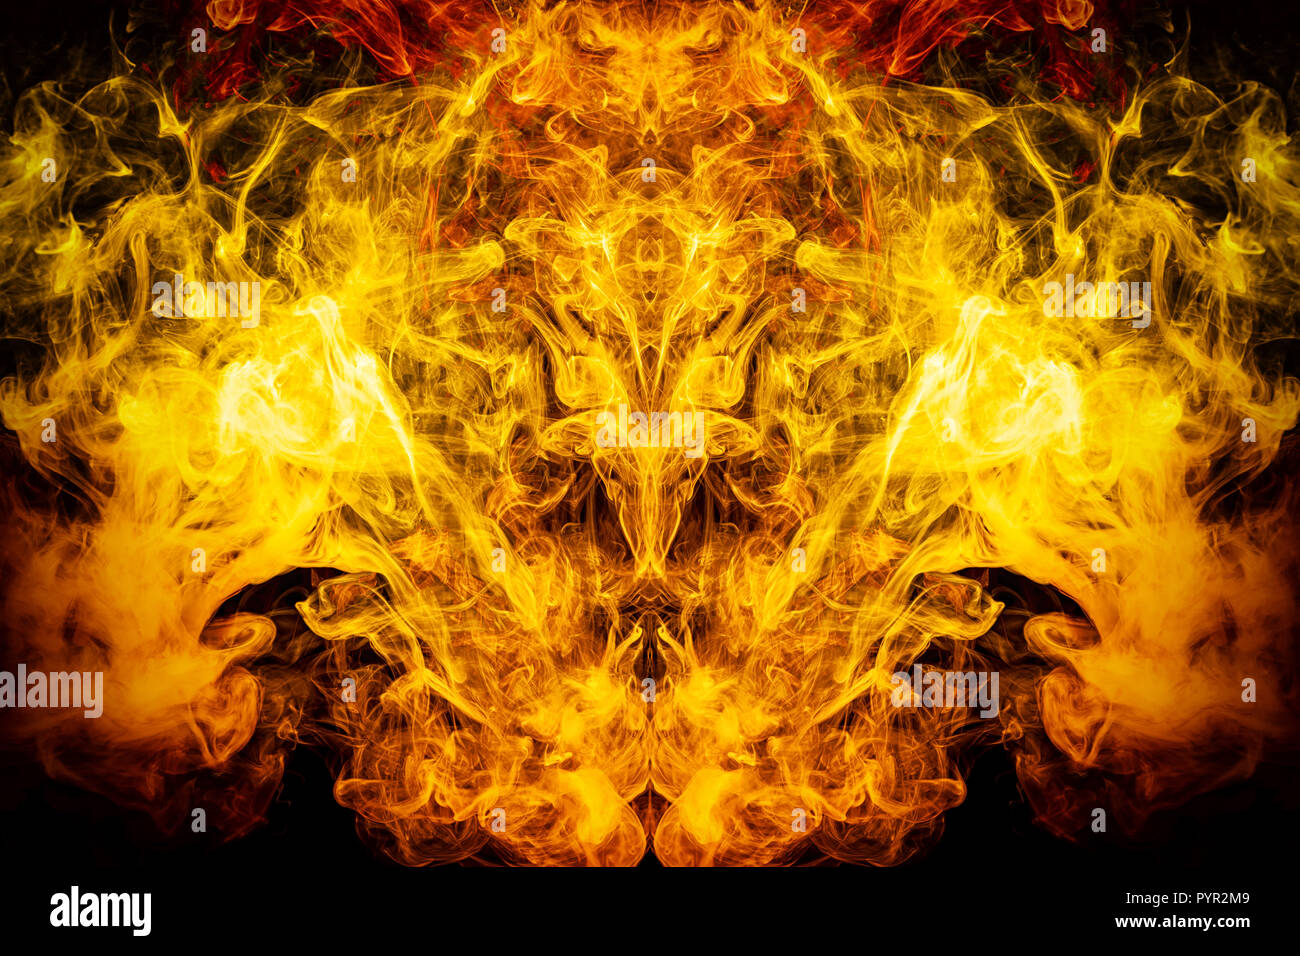 Campfire Chat Fantasy Art